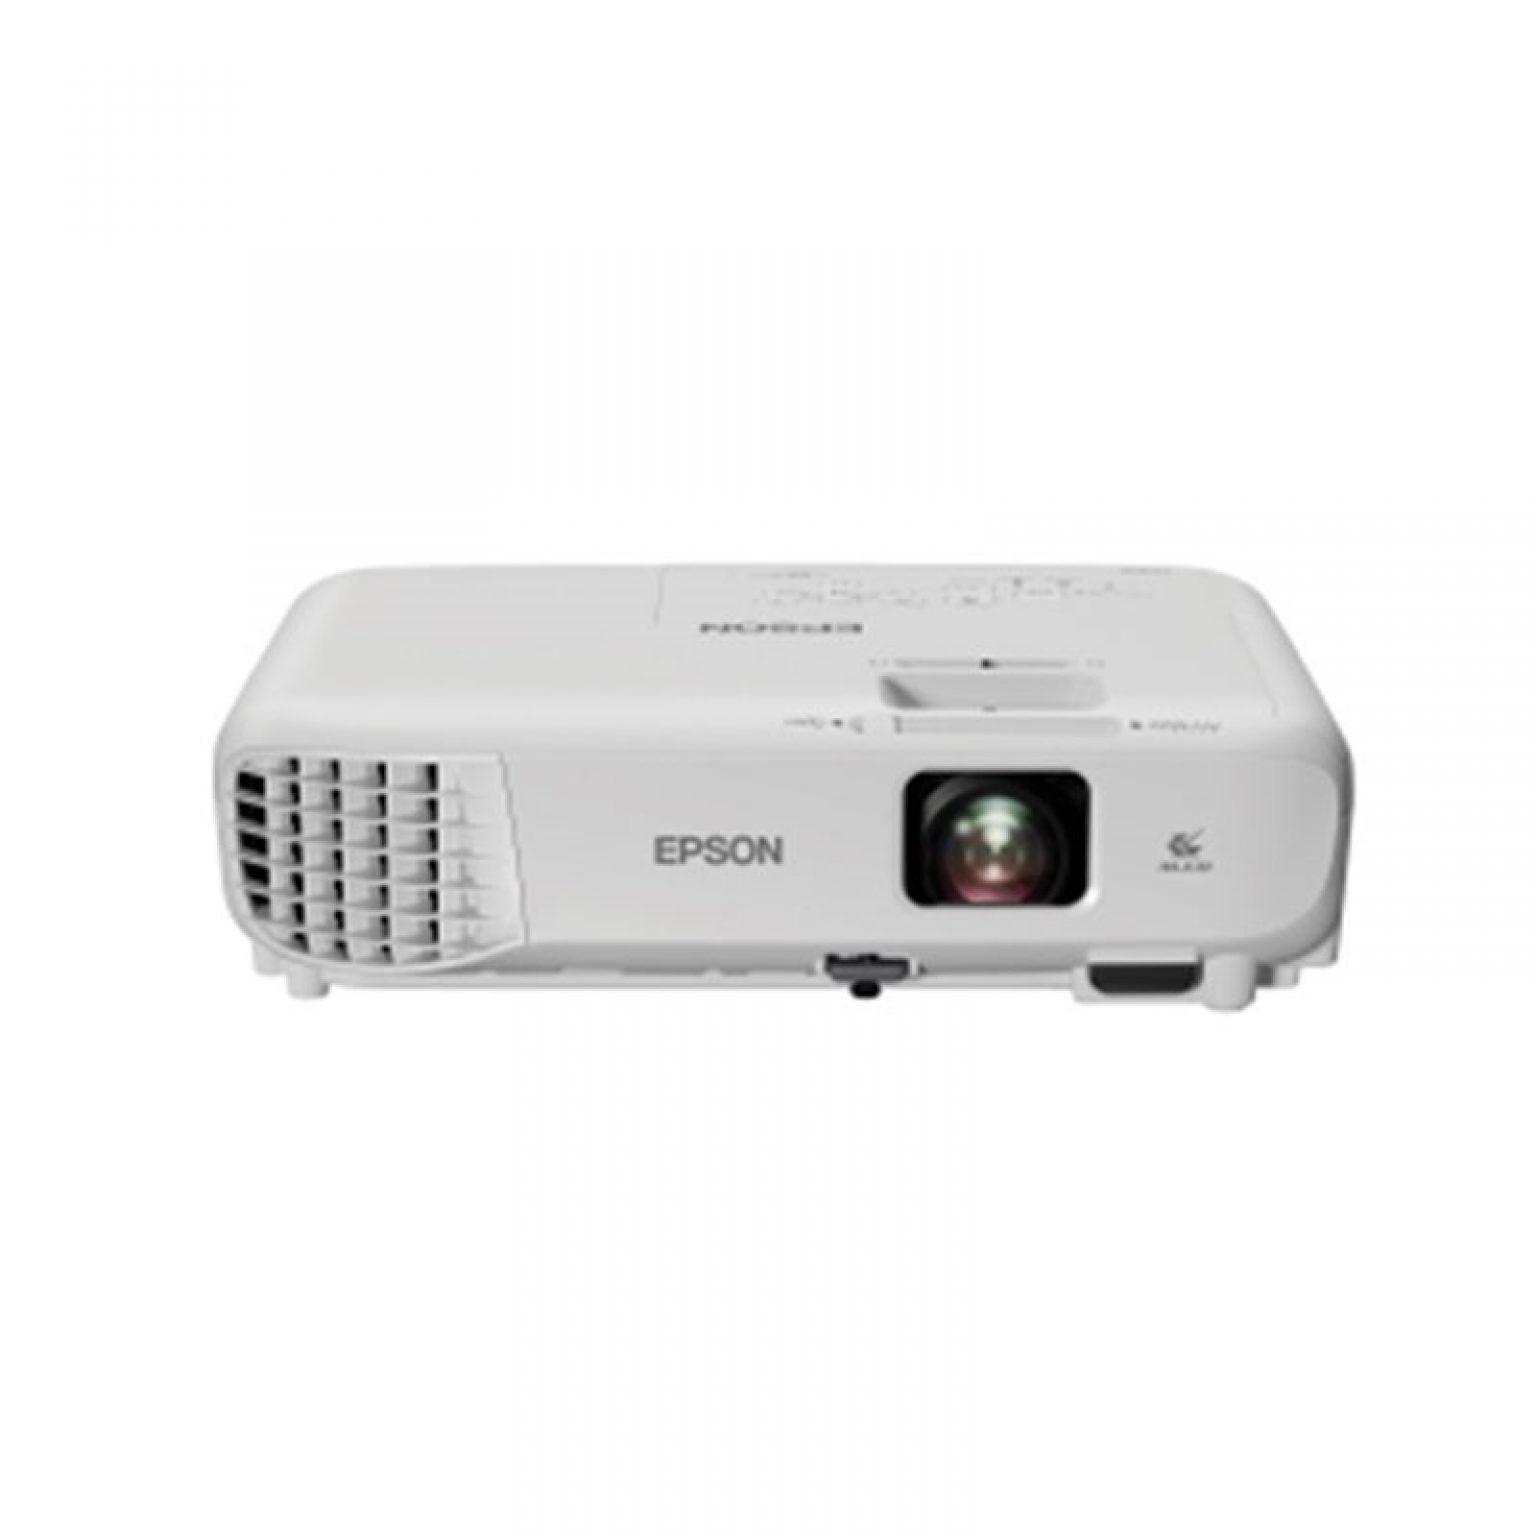 EPSON - Projector EB-X450